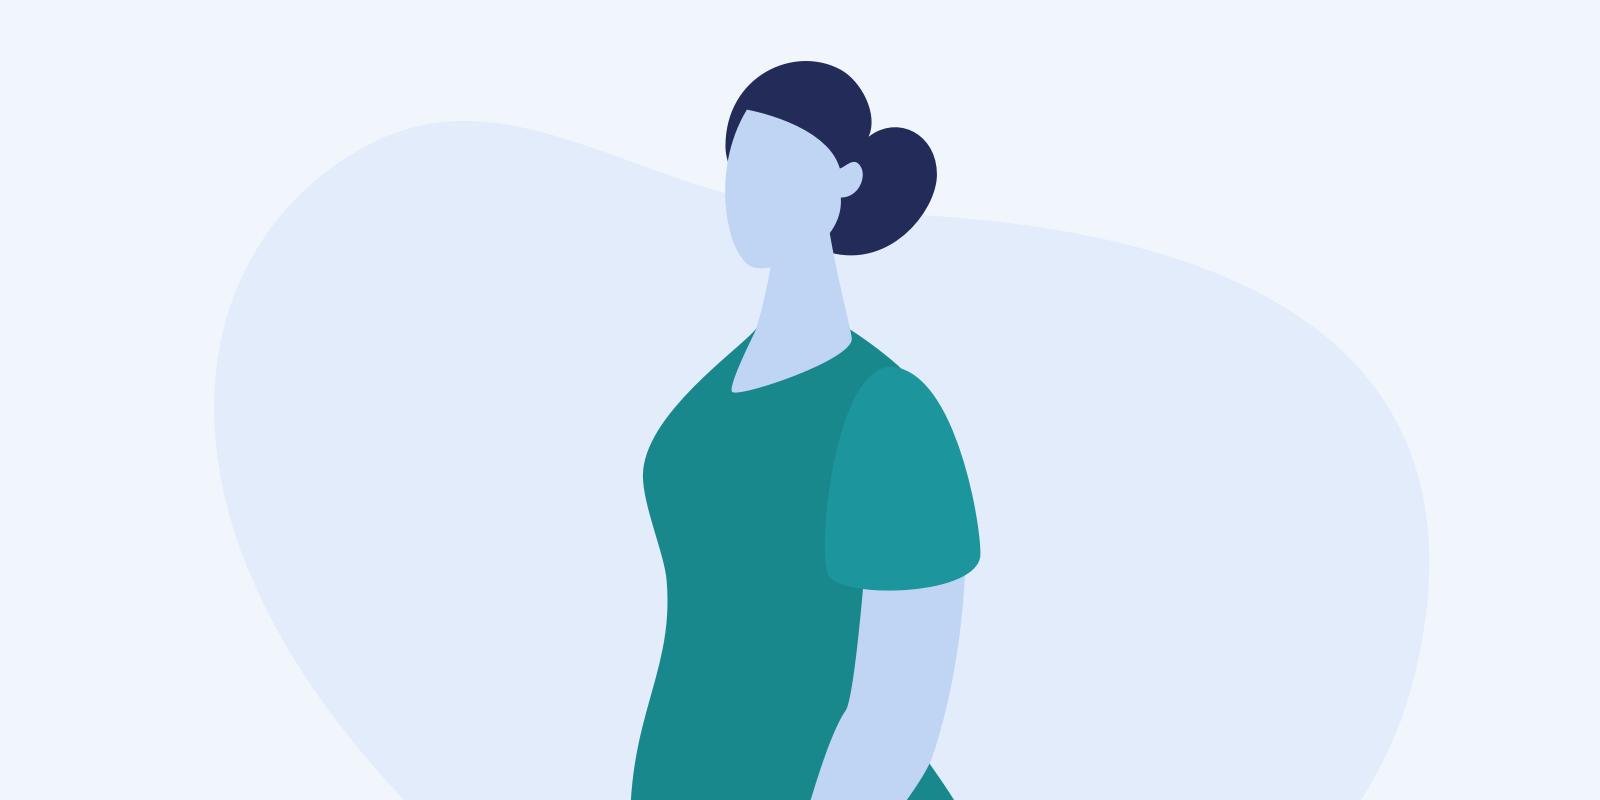 sygeplejerske løn